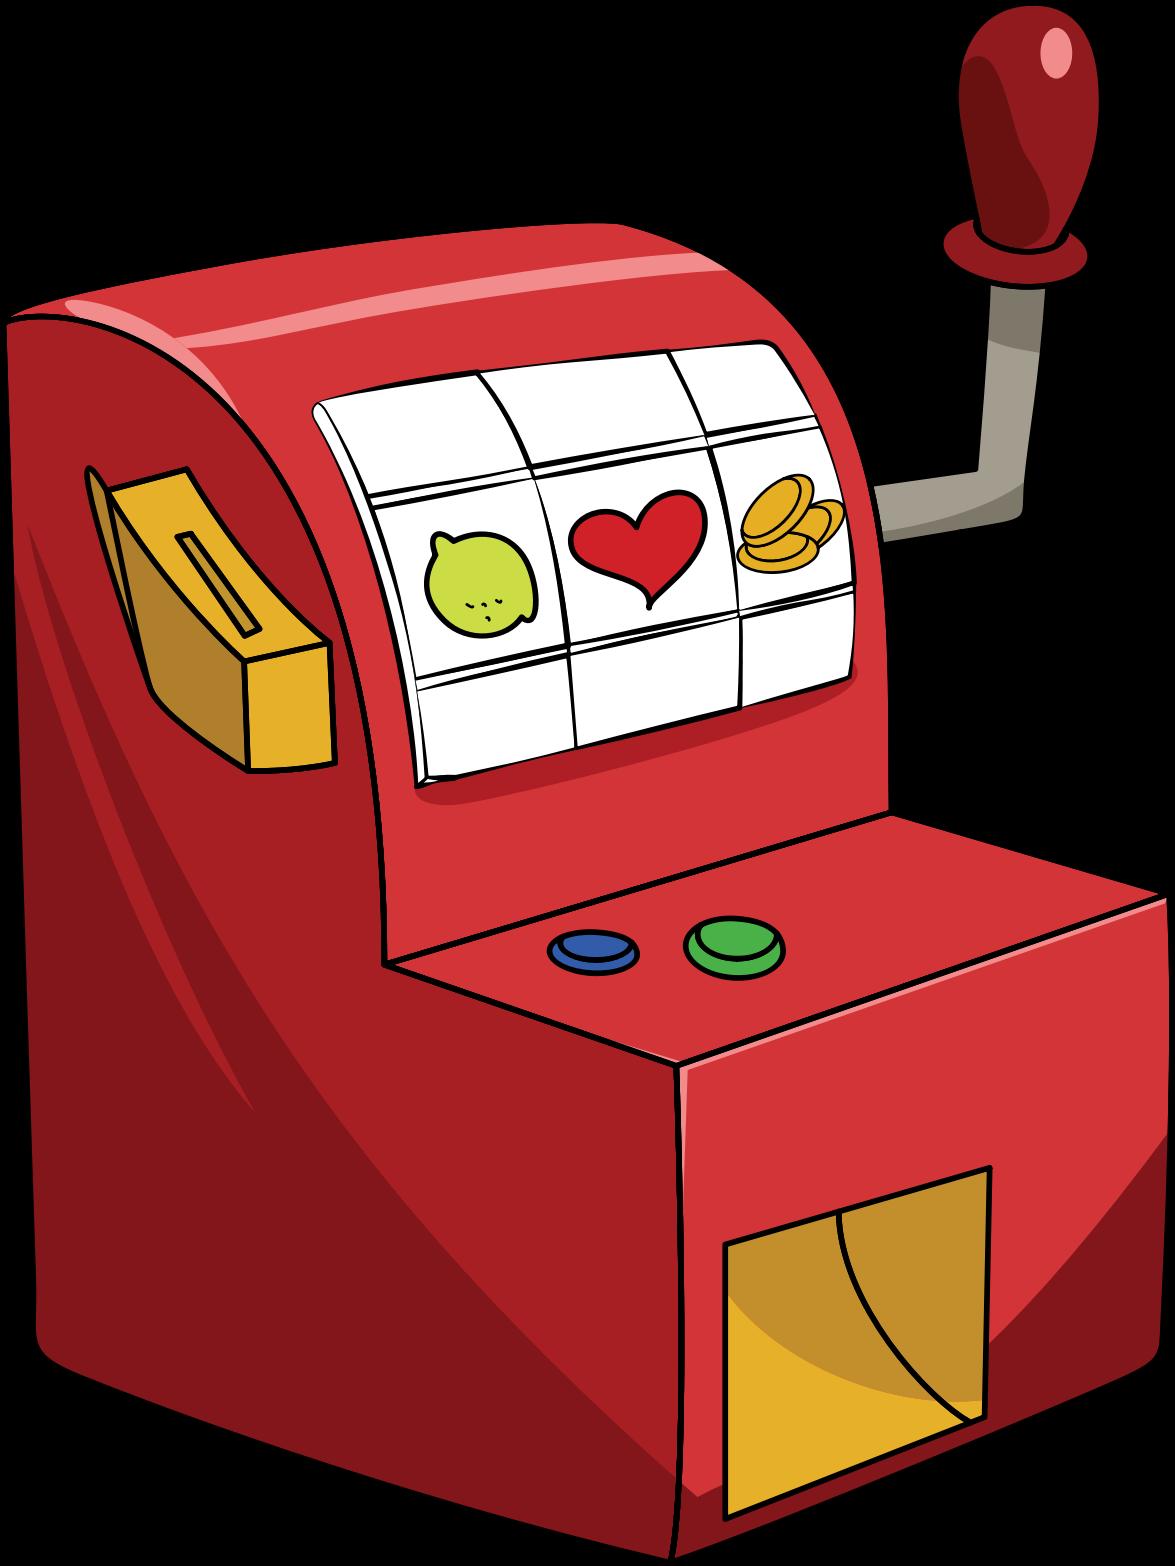 Little red slot machine. Holidays clipart casino